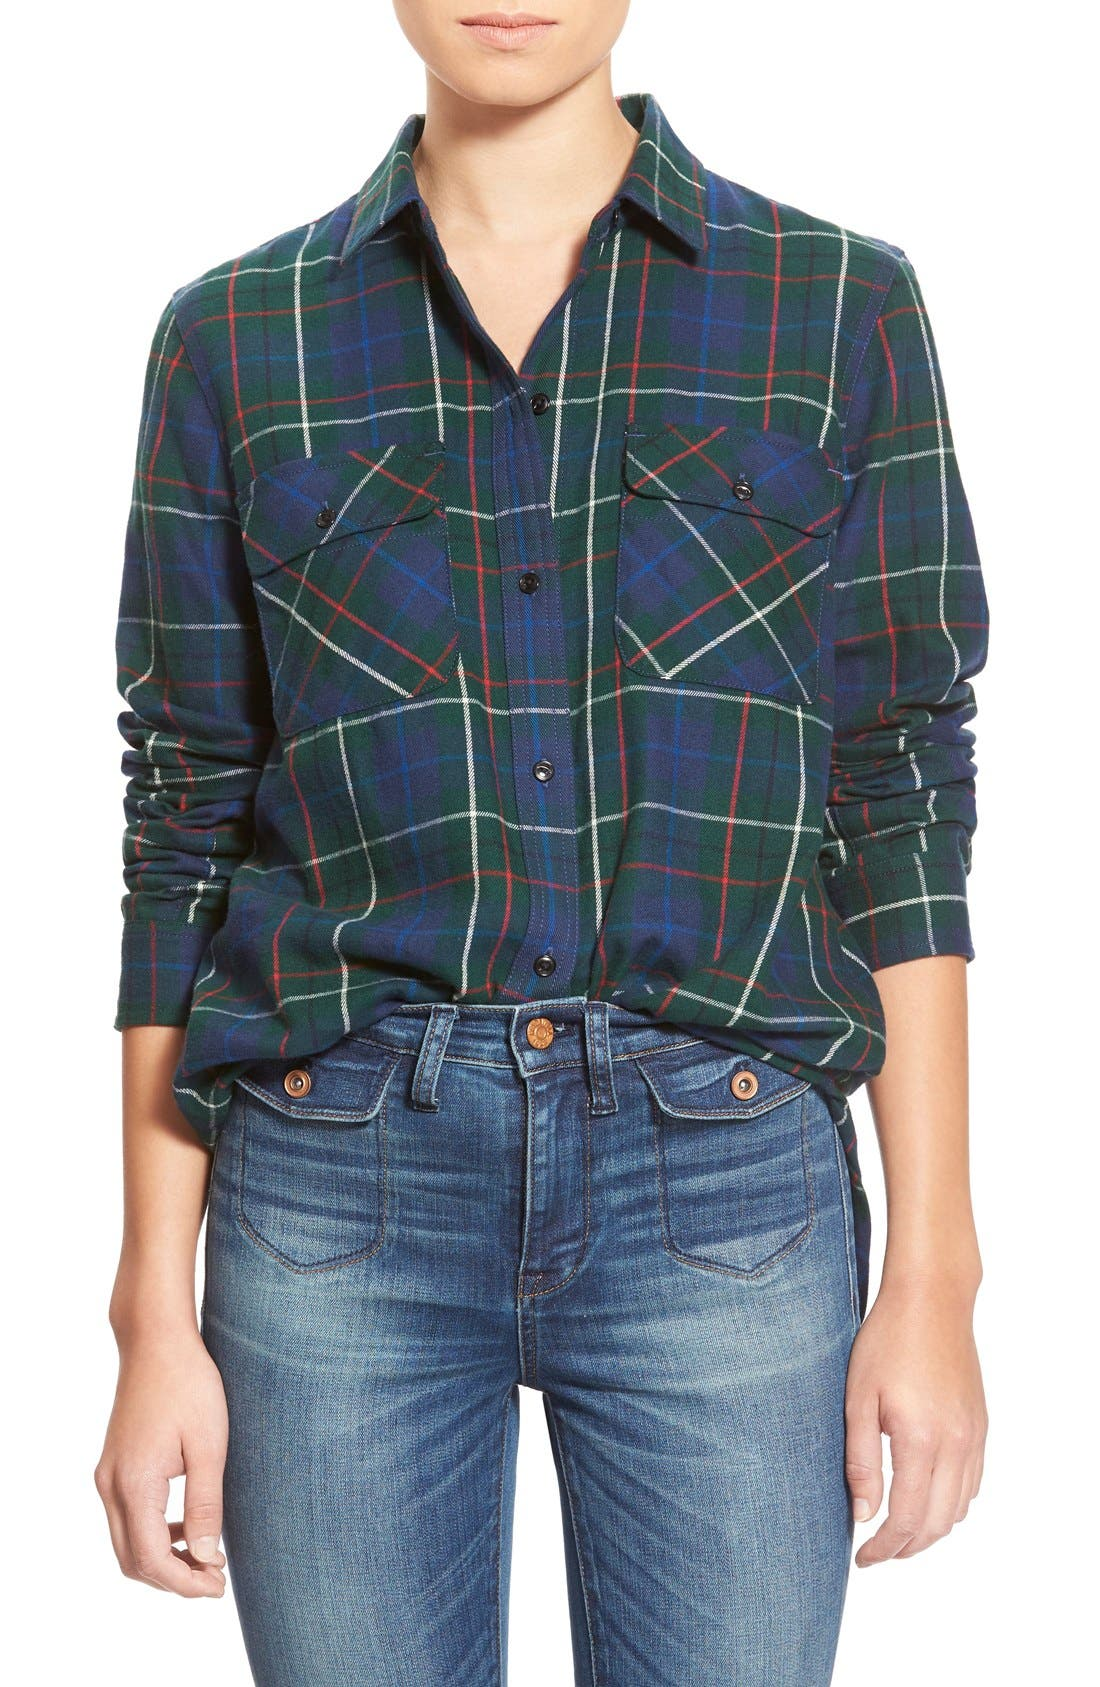 Ex Boyfriend - Ontario Plaid Flannel Shirt,                         Main,                         color,